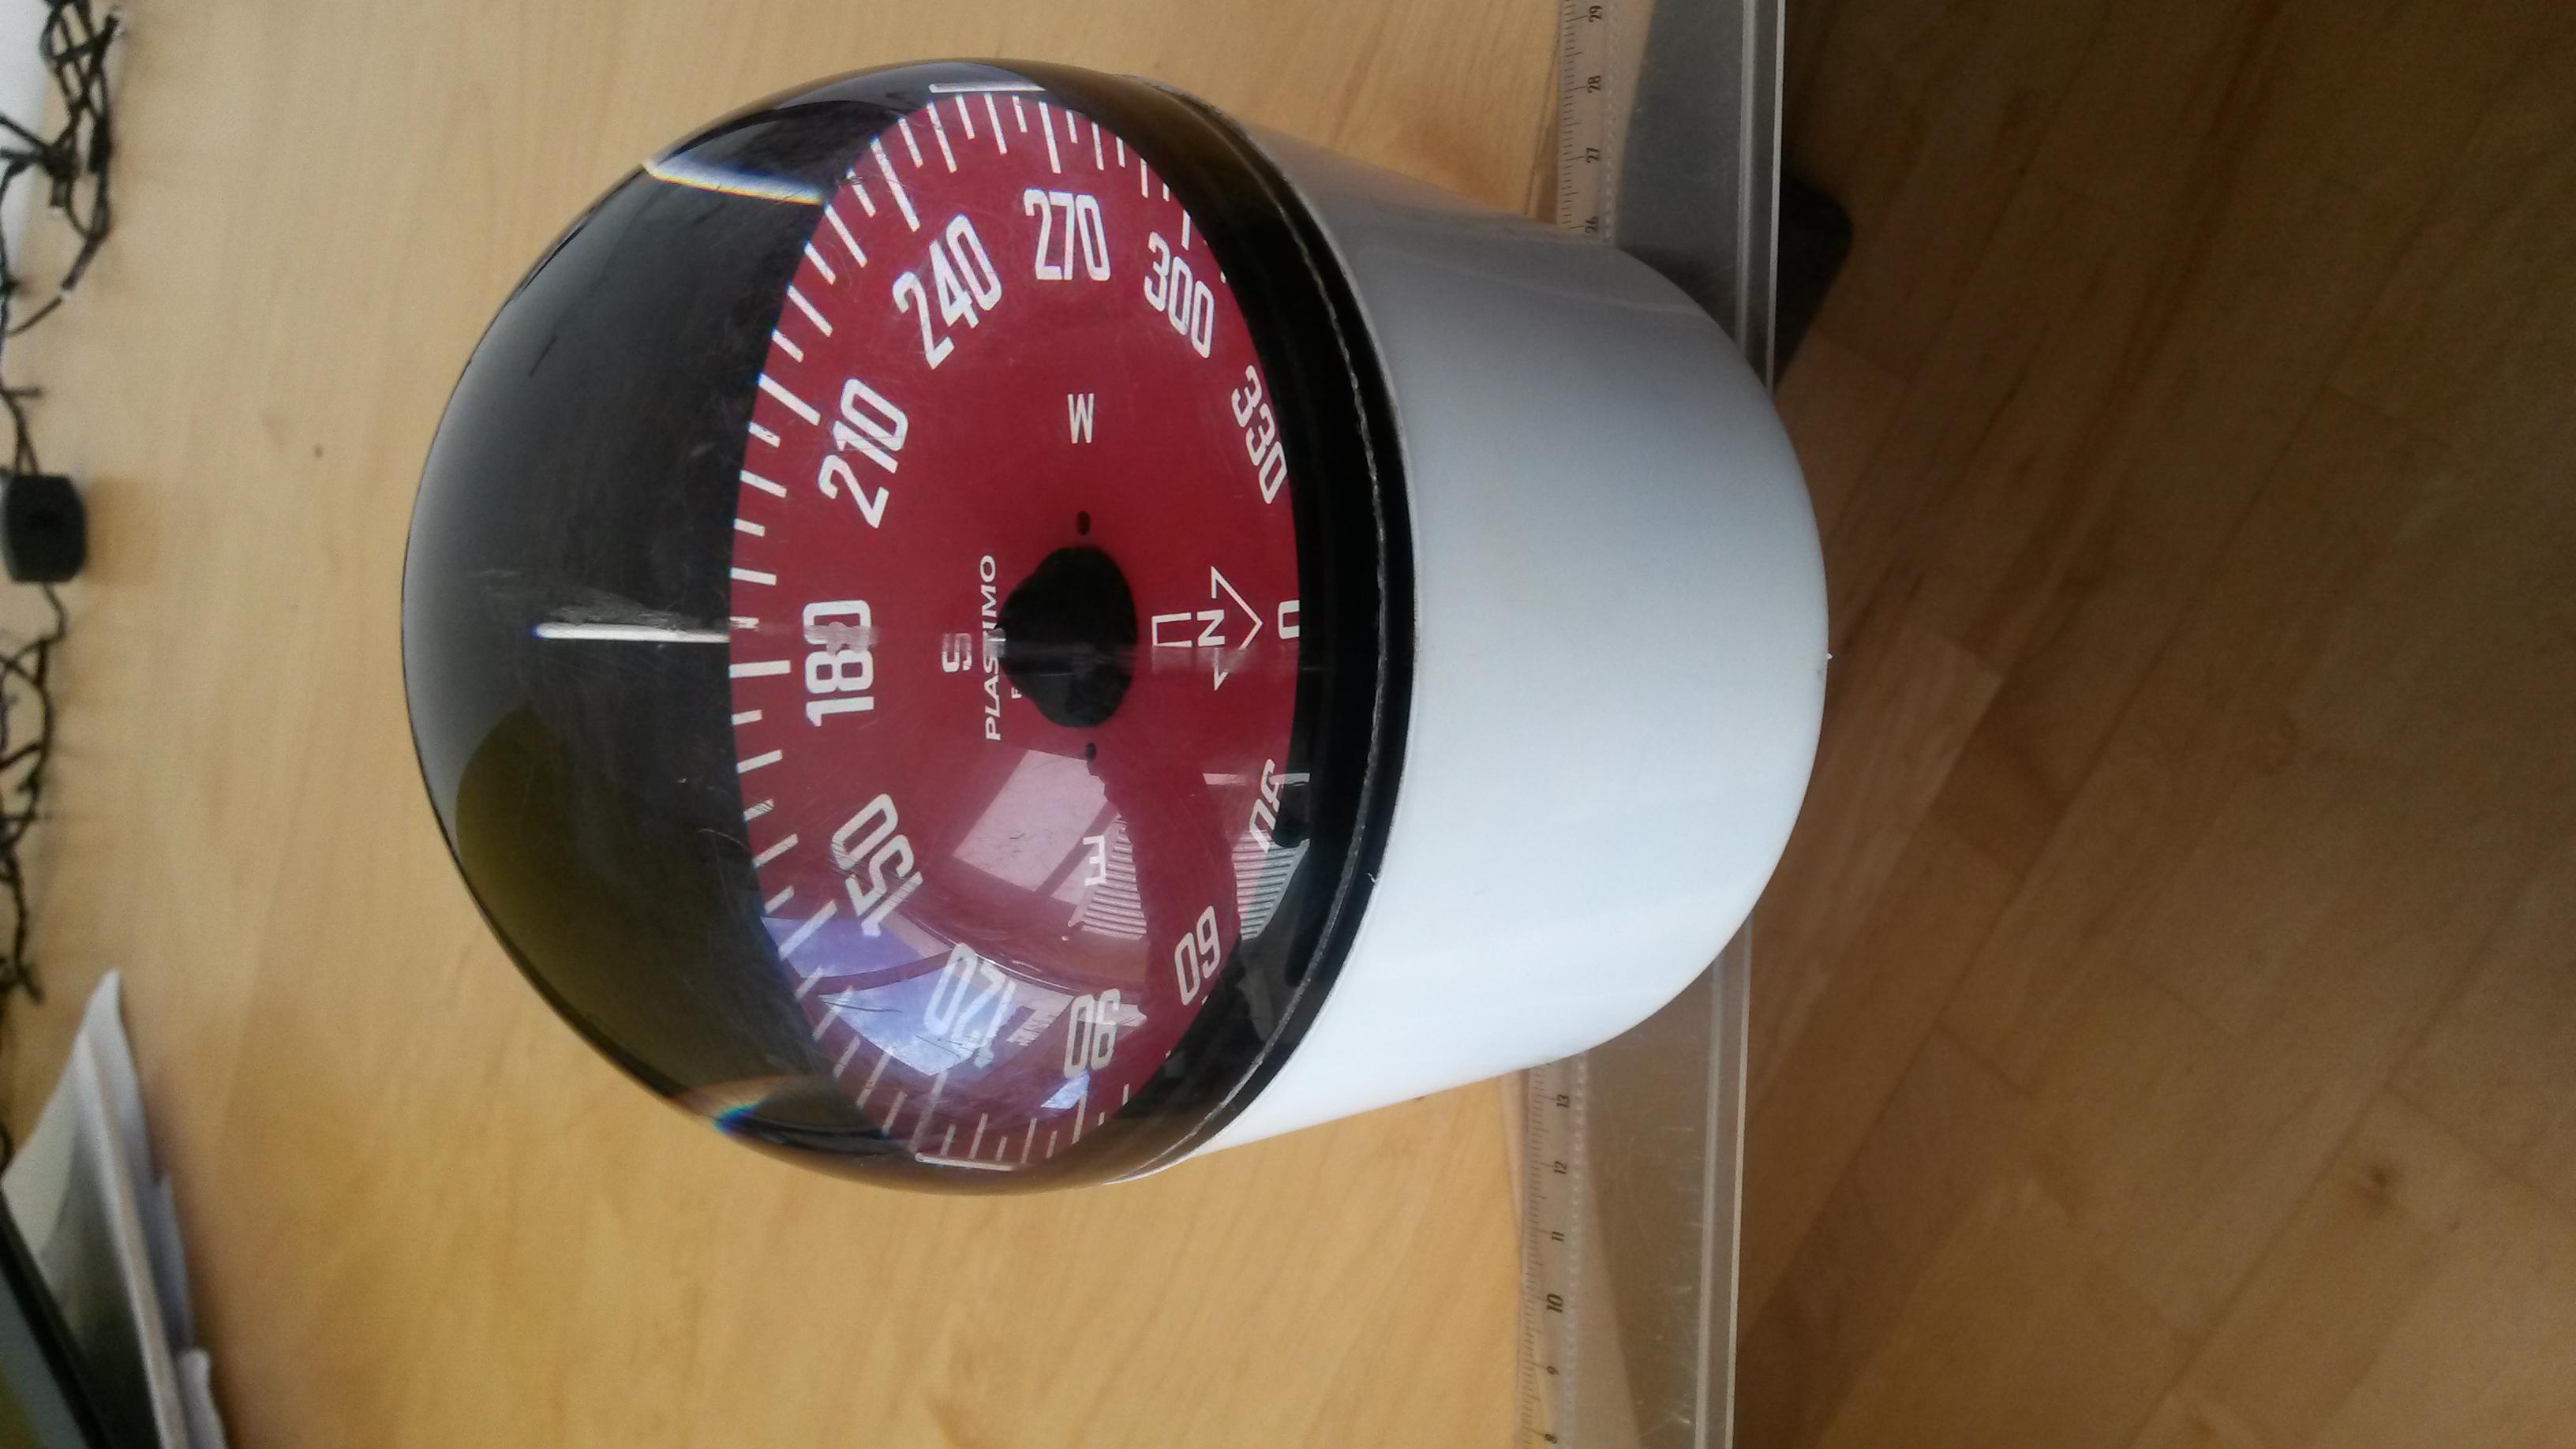 COMPAS OLYMPIC PLASTIMO 120MM SUR FUT